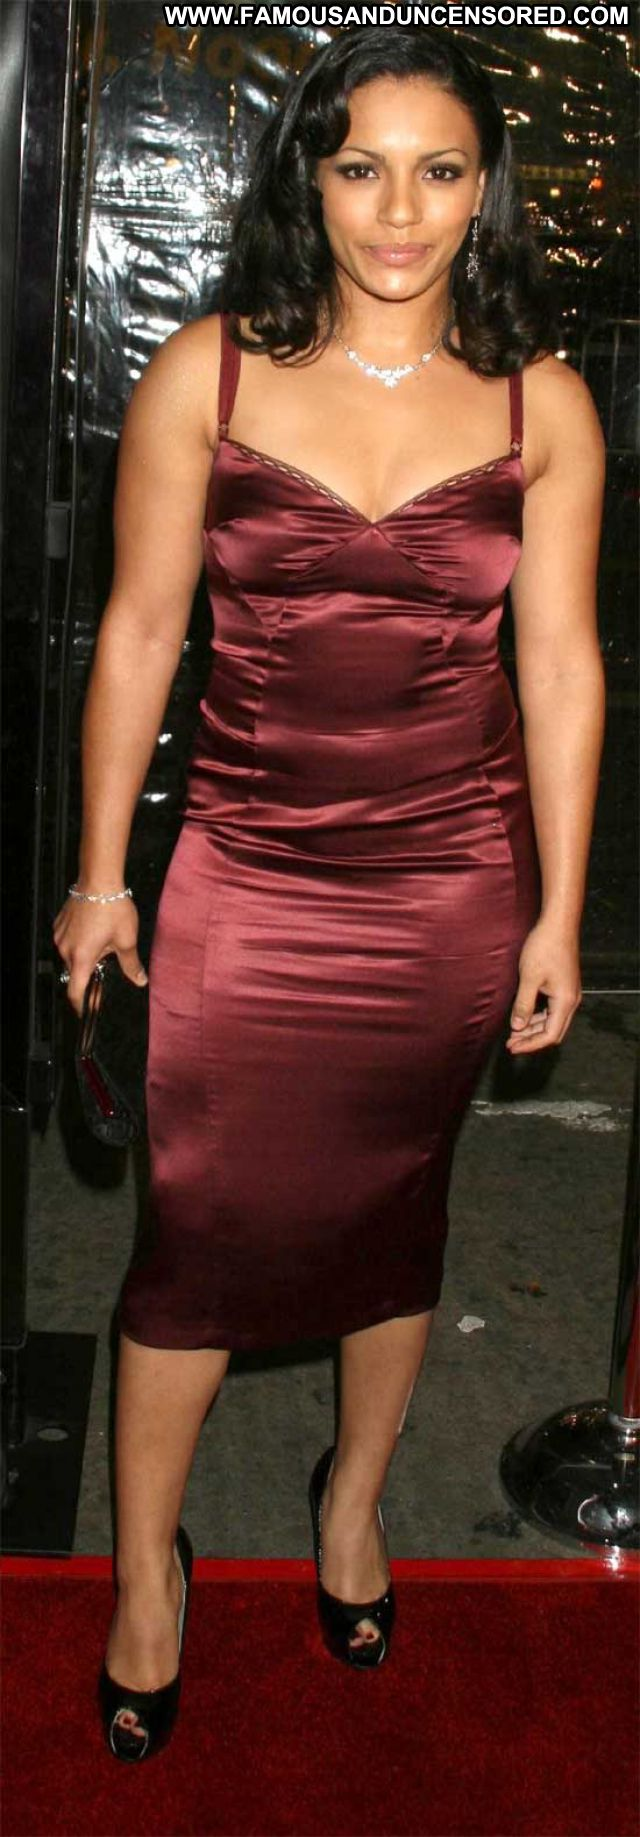 April Hernandez No Source Celebrity Celebrity Latina Babe Posing Hot